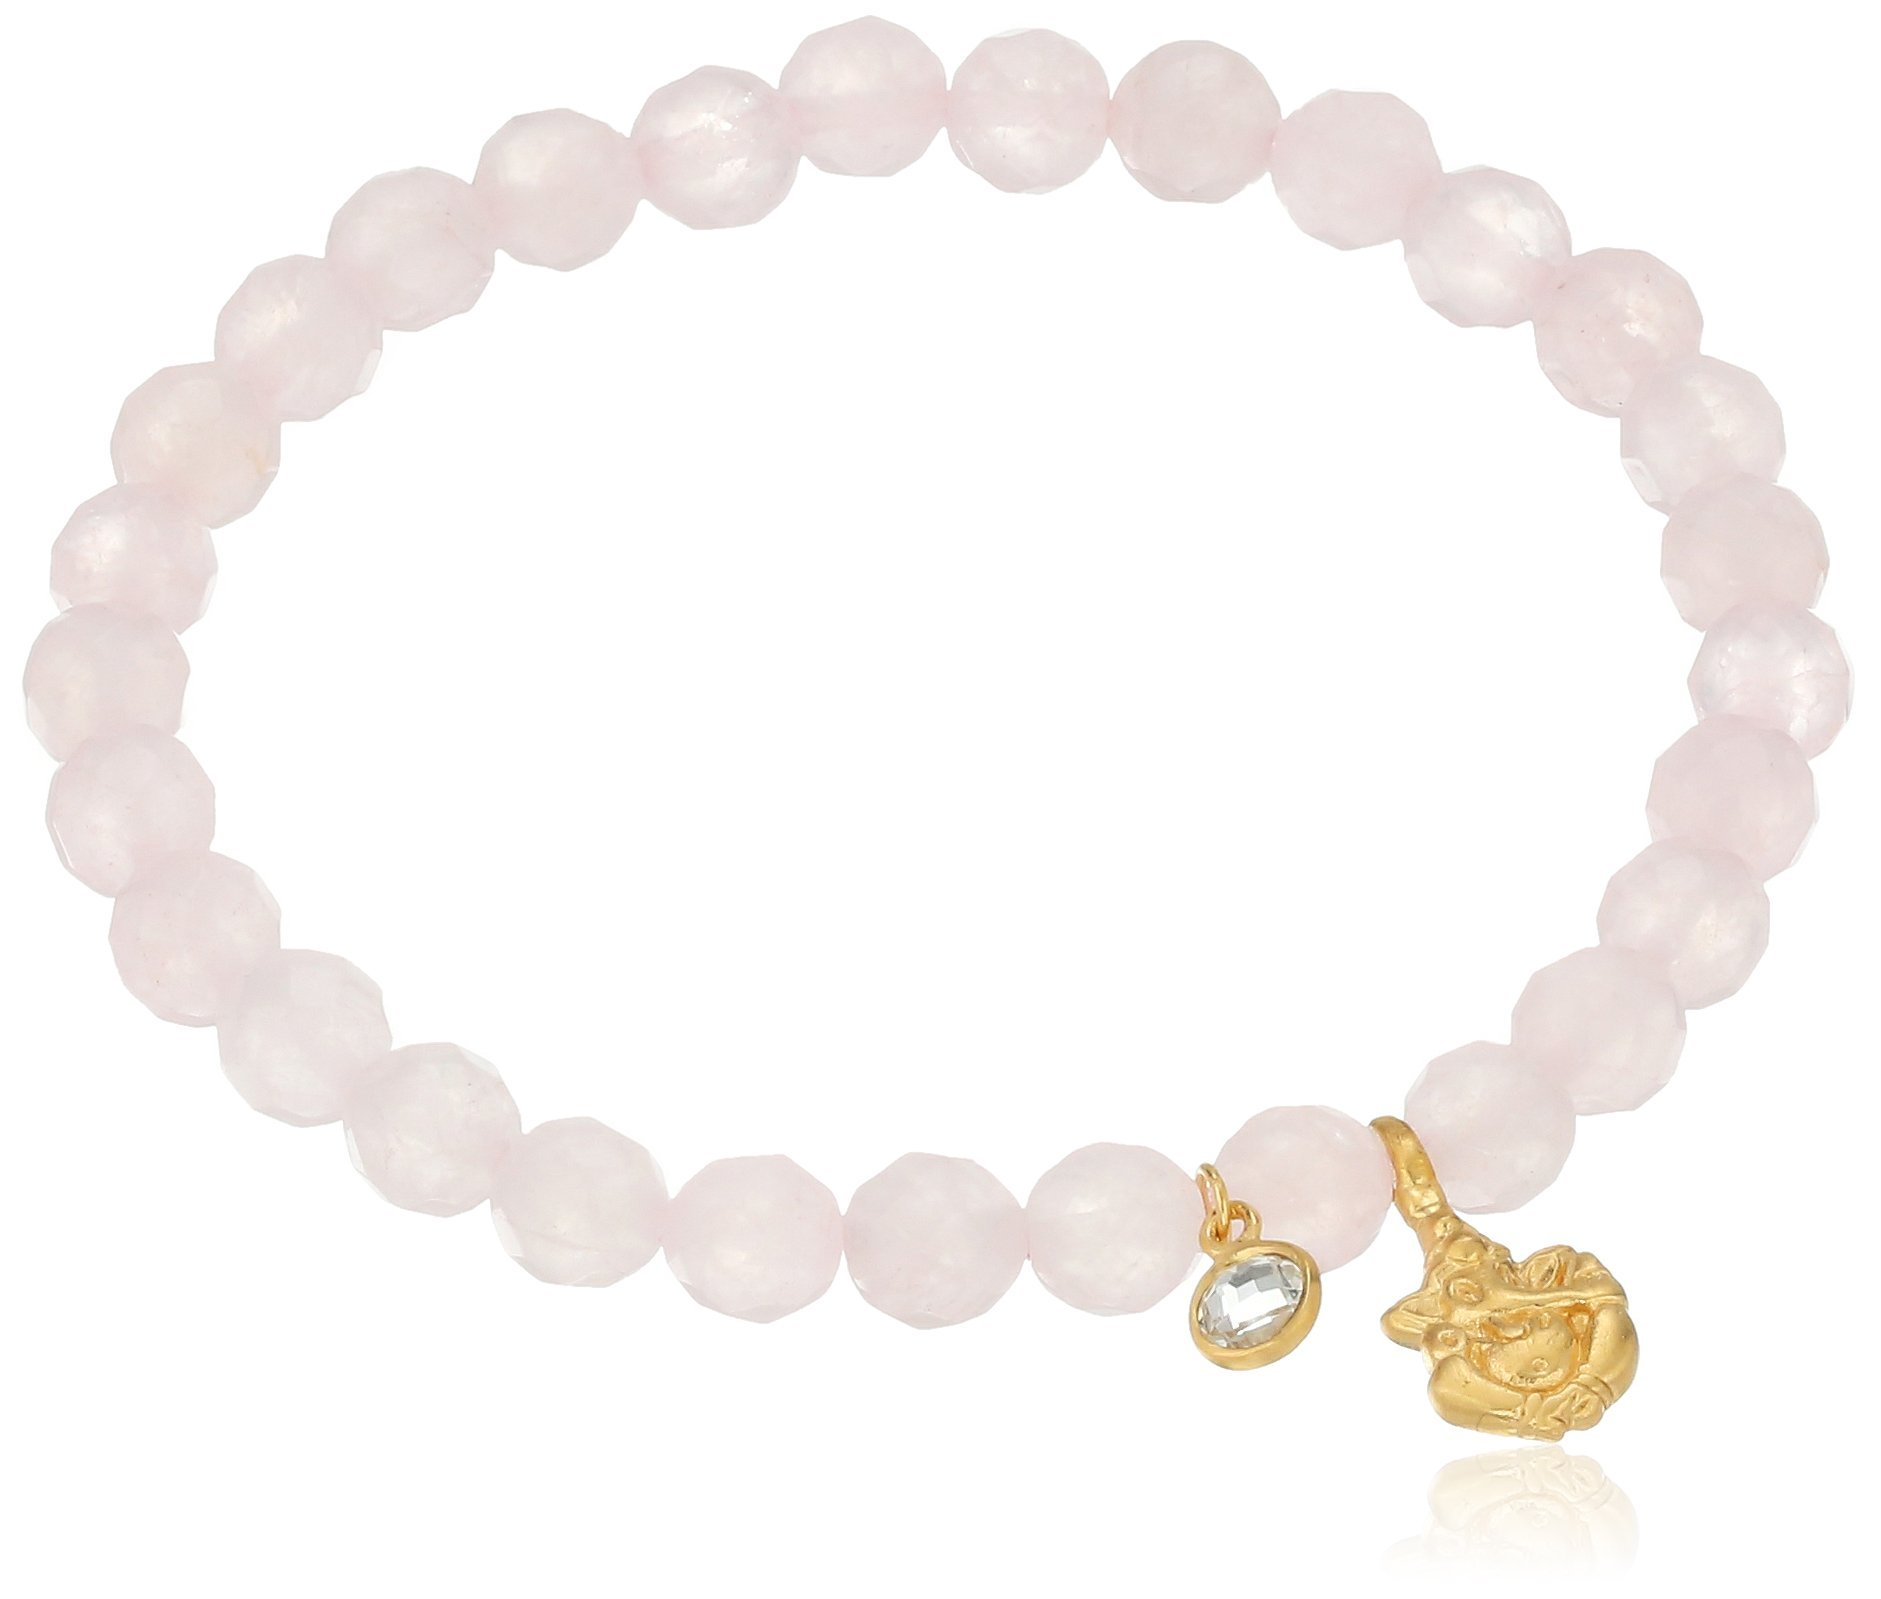 Satya Jewelry Rose Quartz White Topaz Ganesha Stretch Bracelet